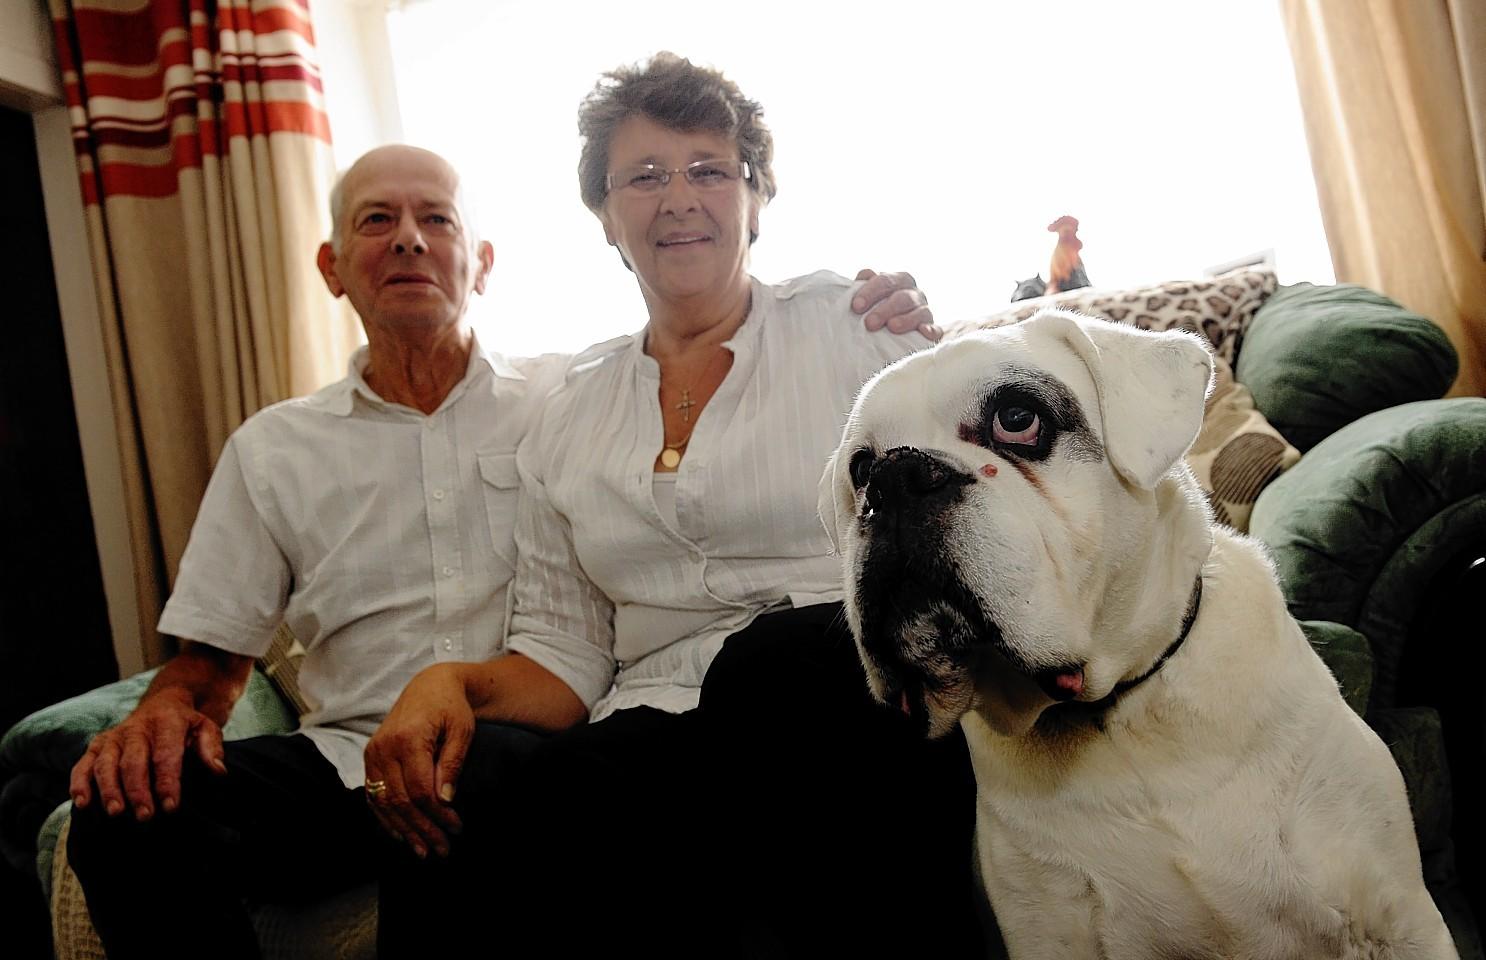 Irene with her husband John and dog Max